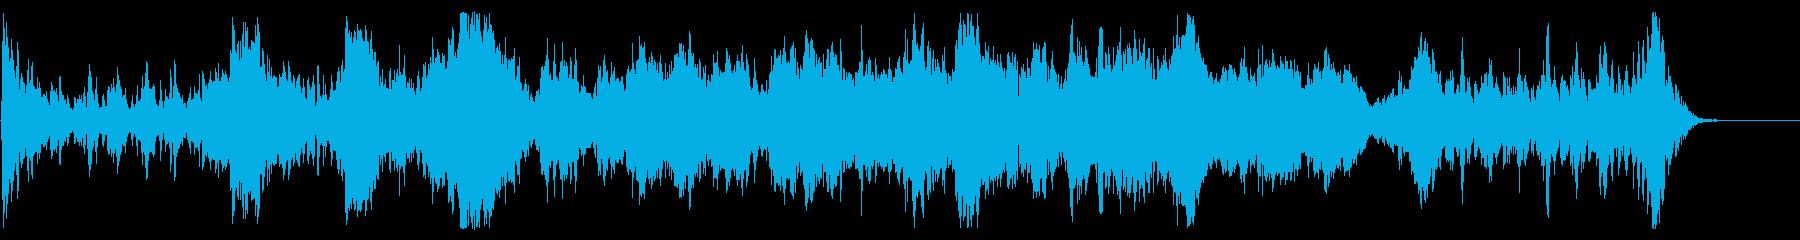 SFやファンタジーの予告動画向けの楽曲の再生済みの波形